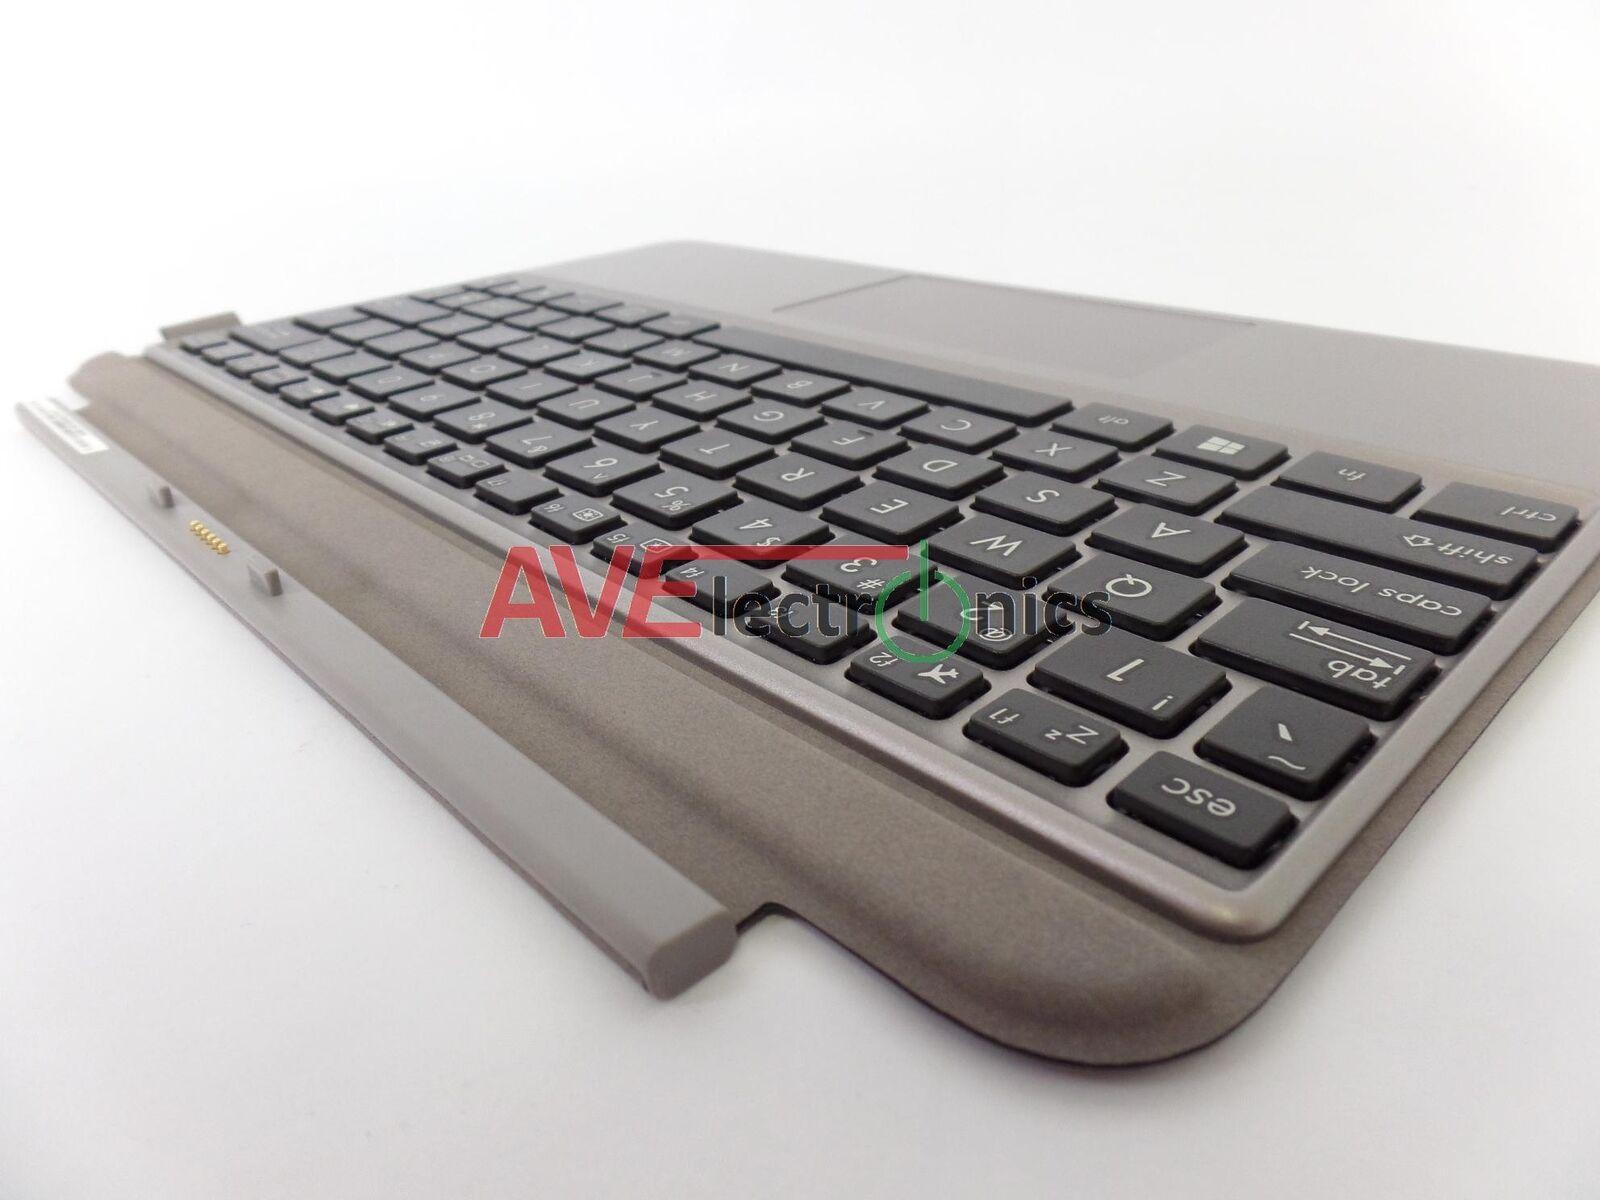 Asus T102HA-3K Gray Keyboard Dock for T102 Tablet OEM Genuine Original Brand New